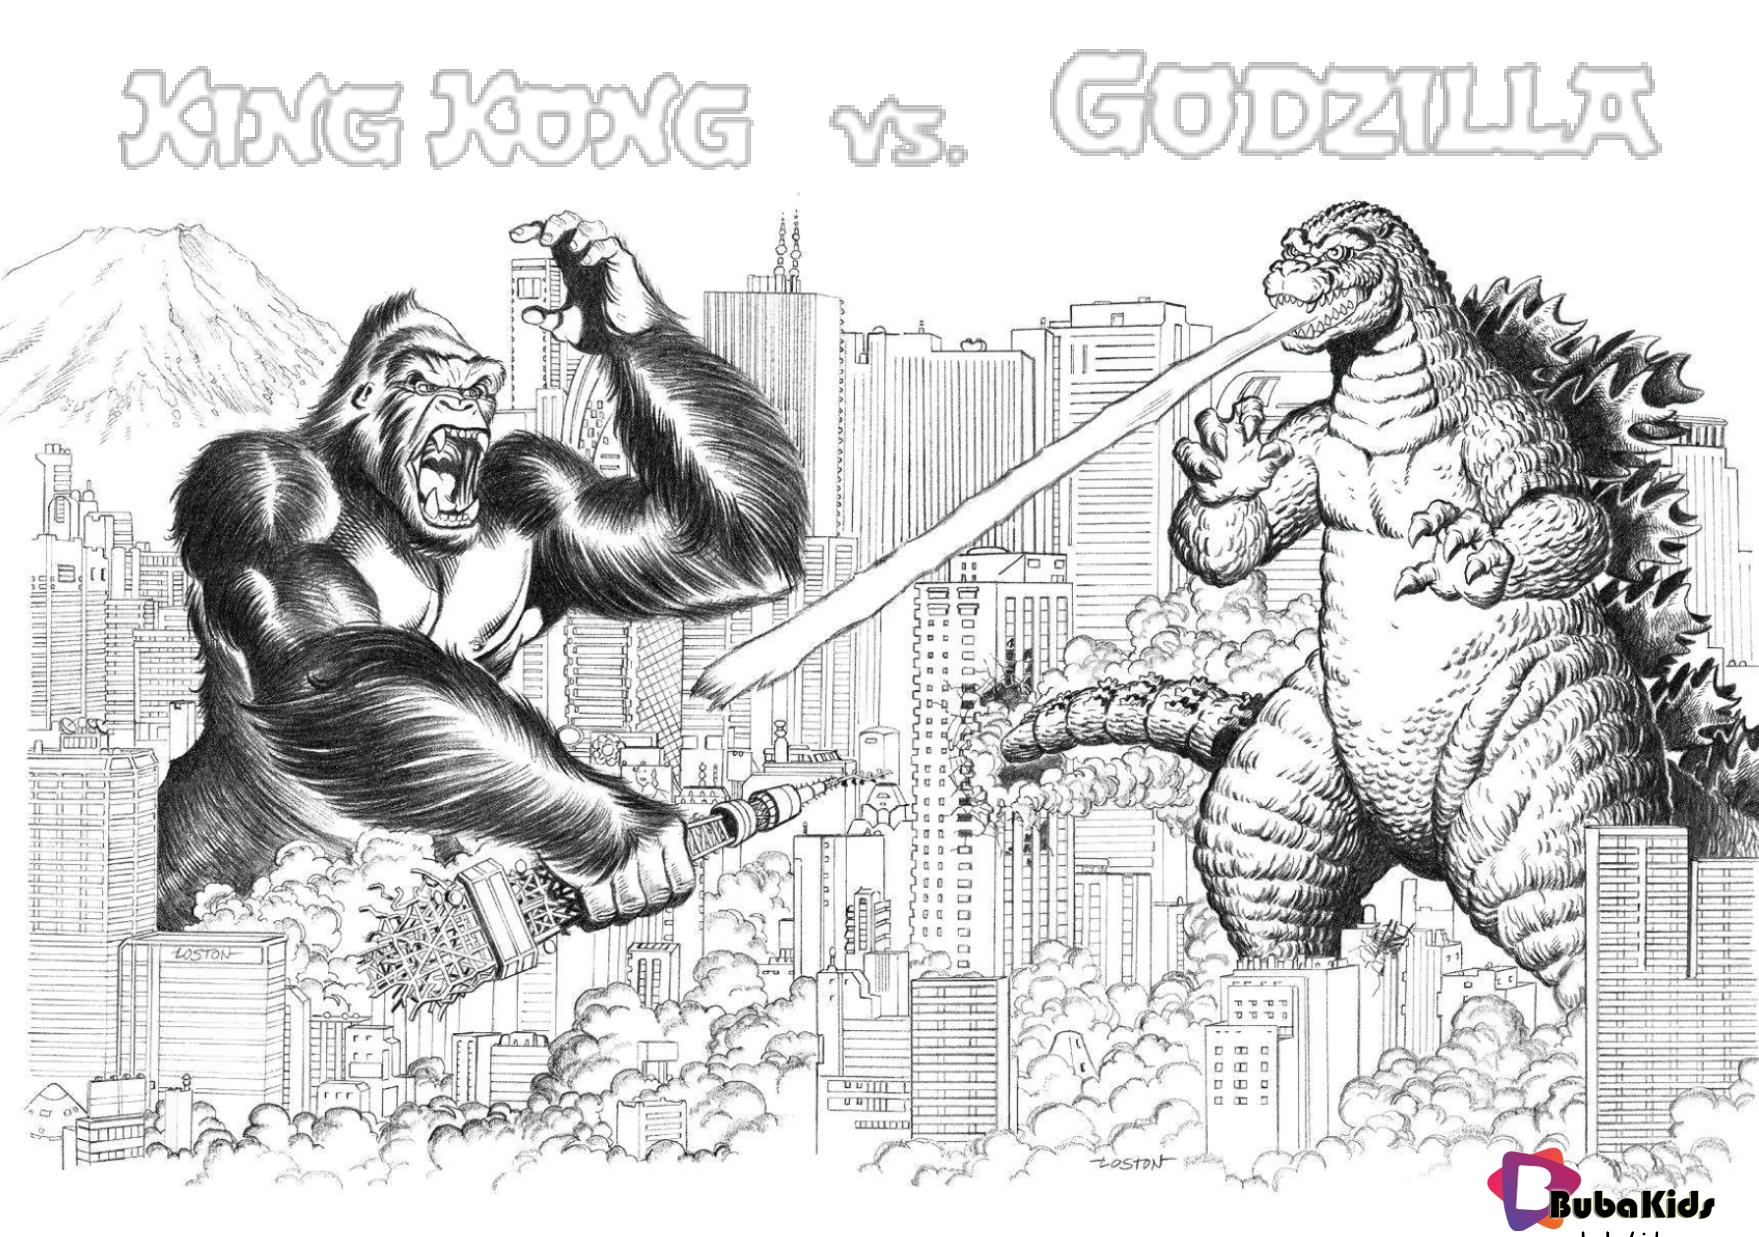 King Kong Vs Godzilla Free And Printable Coloring Page Godzilla King Kong Godzilla Kingkong Cartoo King Kong Vs Godzilla Cartoon Coloring Pages King Kong